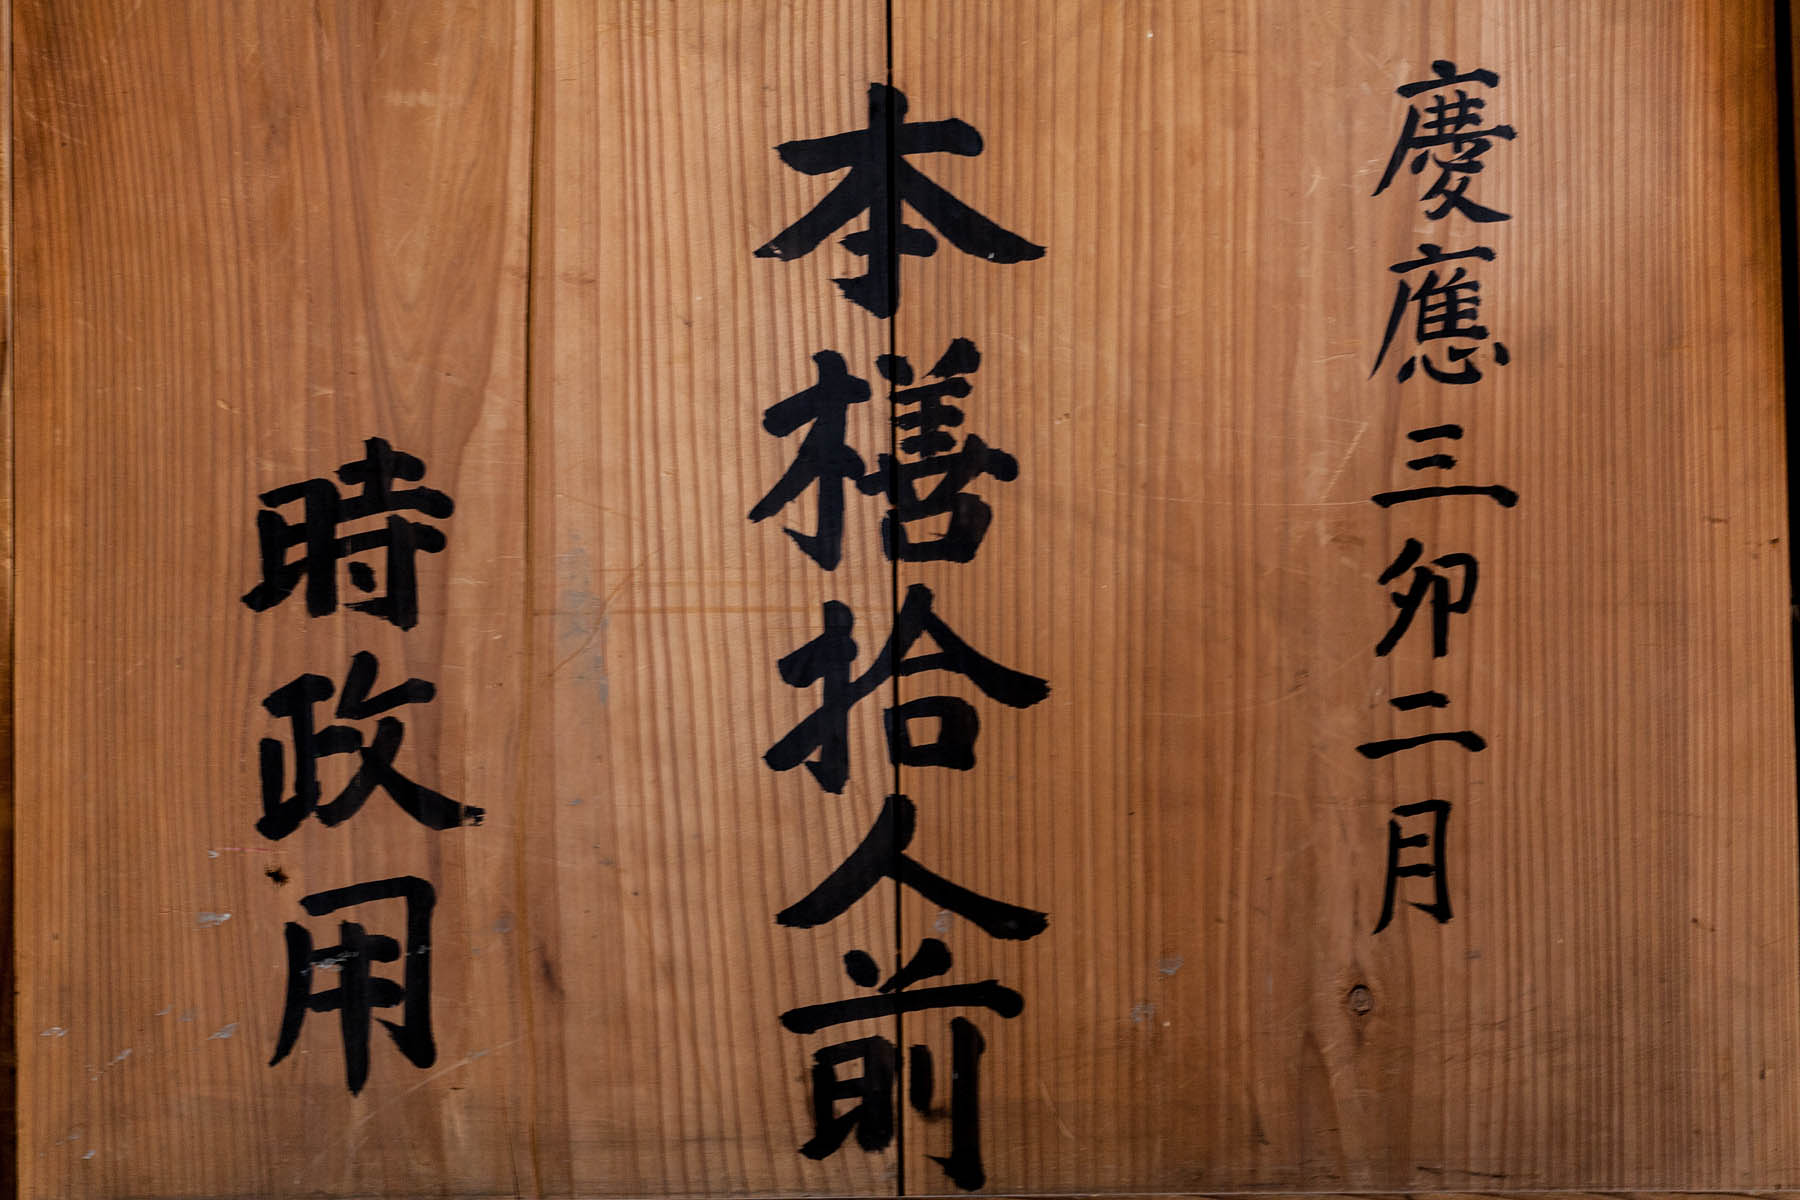 Mood_kame_japanese_bakery_edison_kanji_2